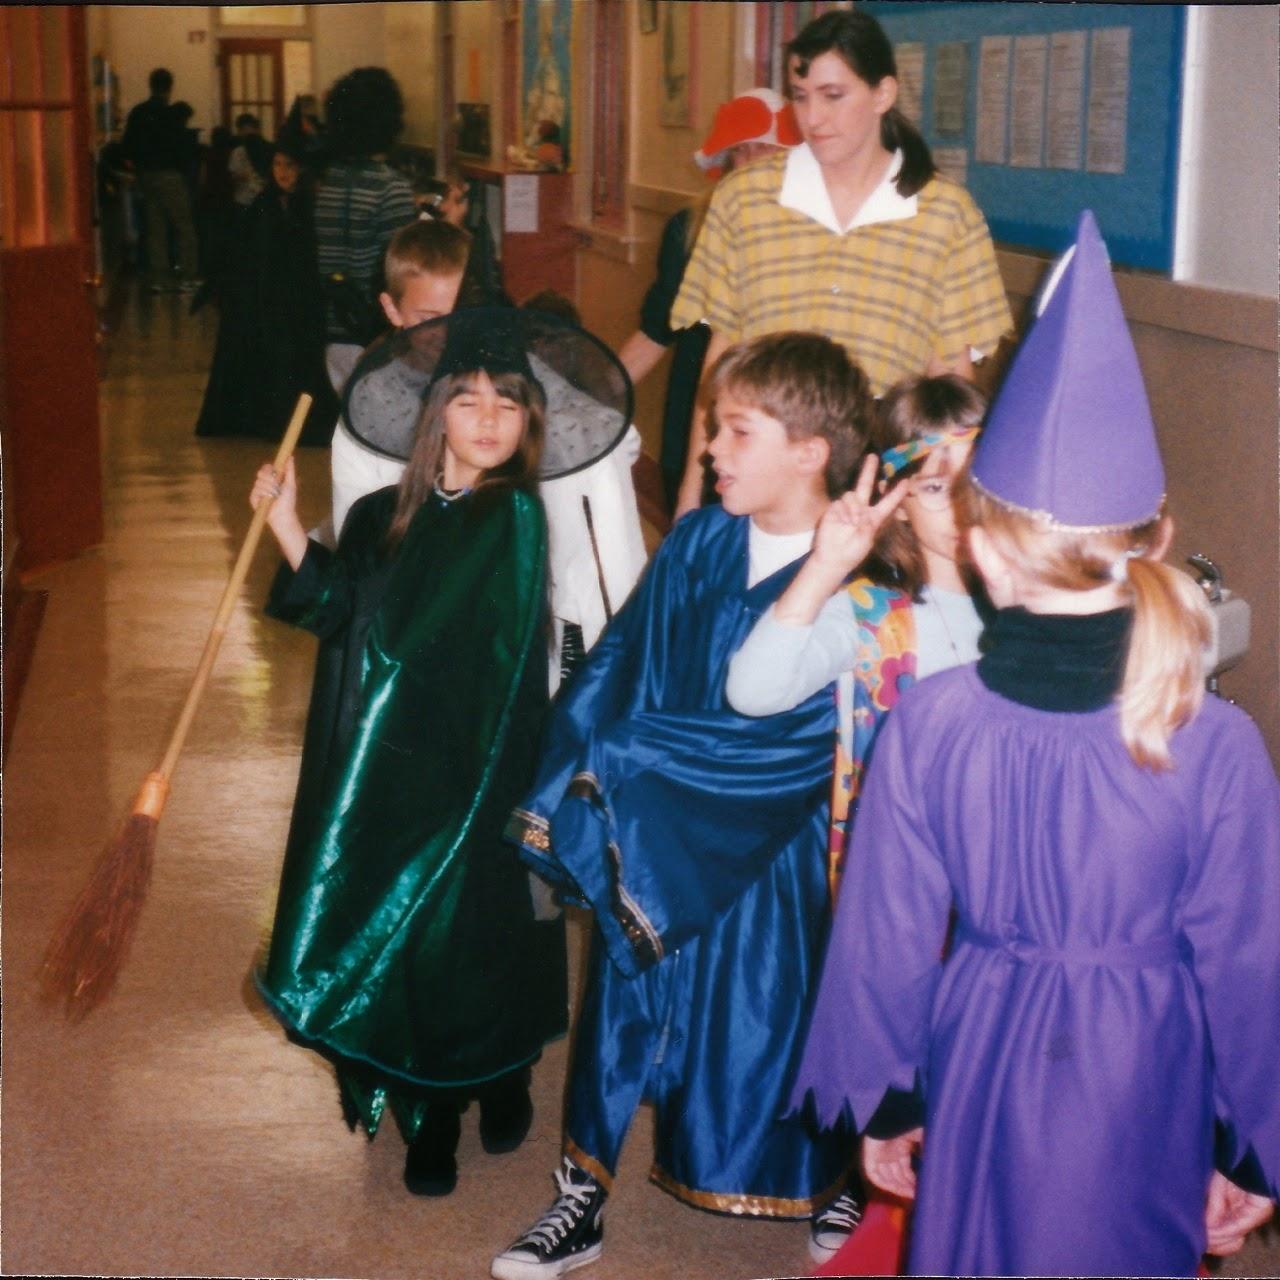 Eugene, Oregon, witch, jedi, hallway, teacher, students, 3rd grade class, 4J, Lane